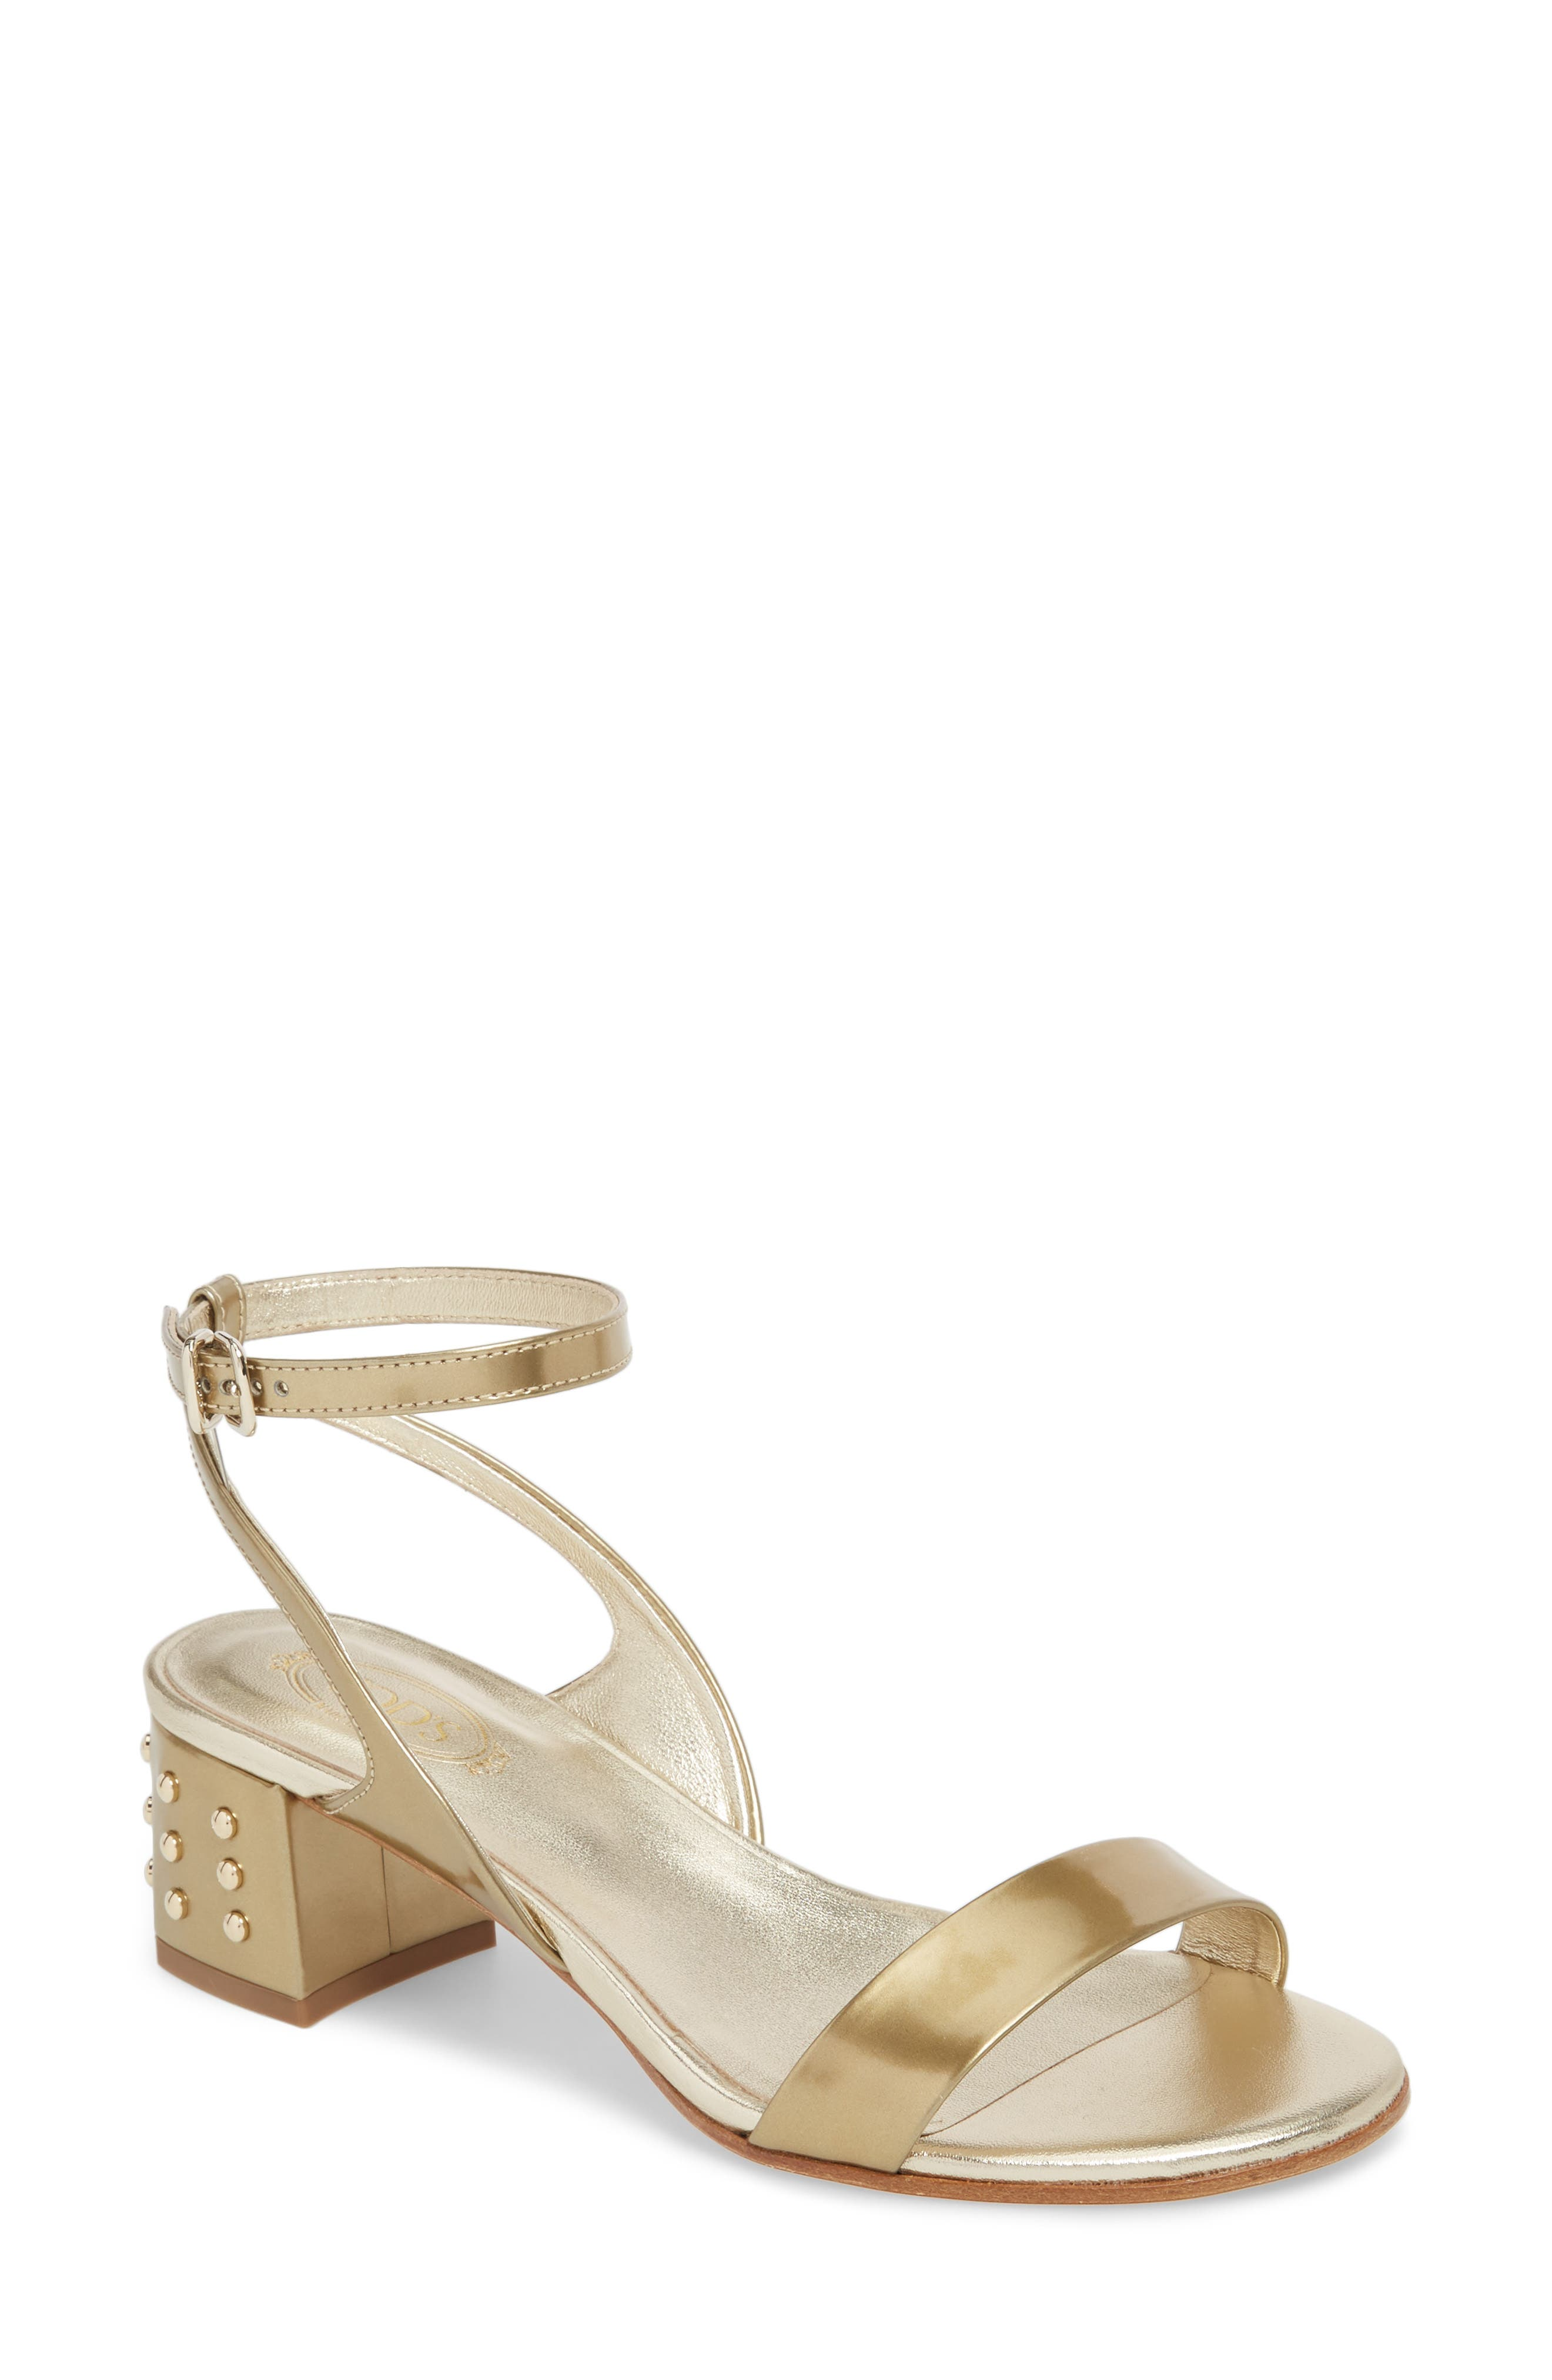 Gommini Block Heel Sandal,                             Main thumbnail 1, color,                             Gold